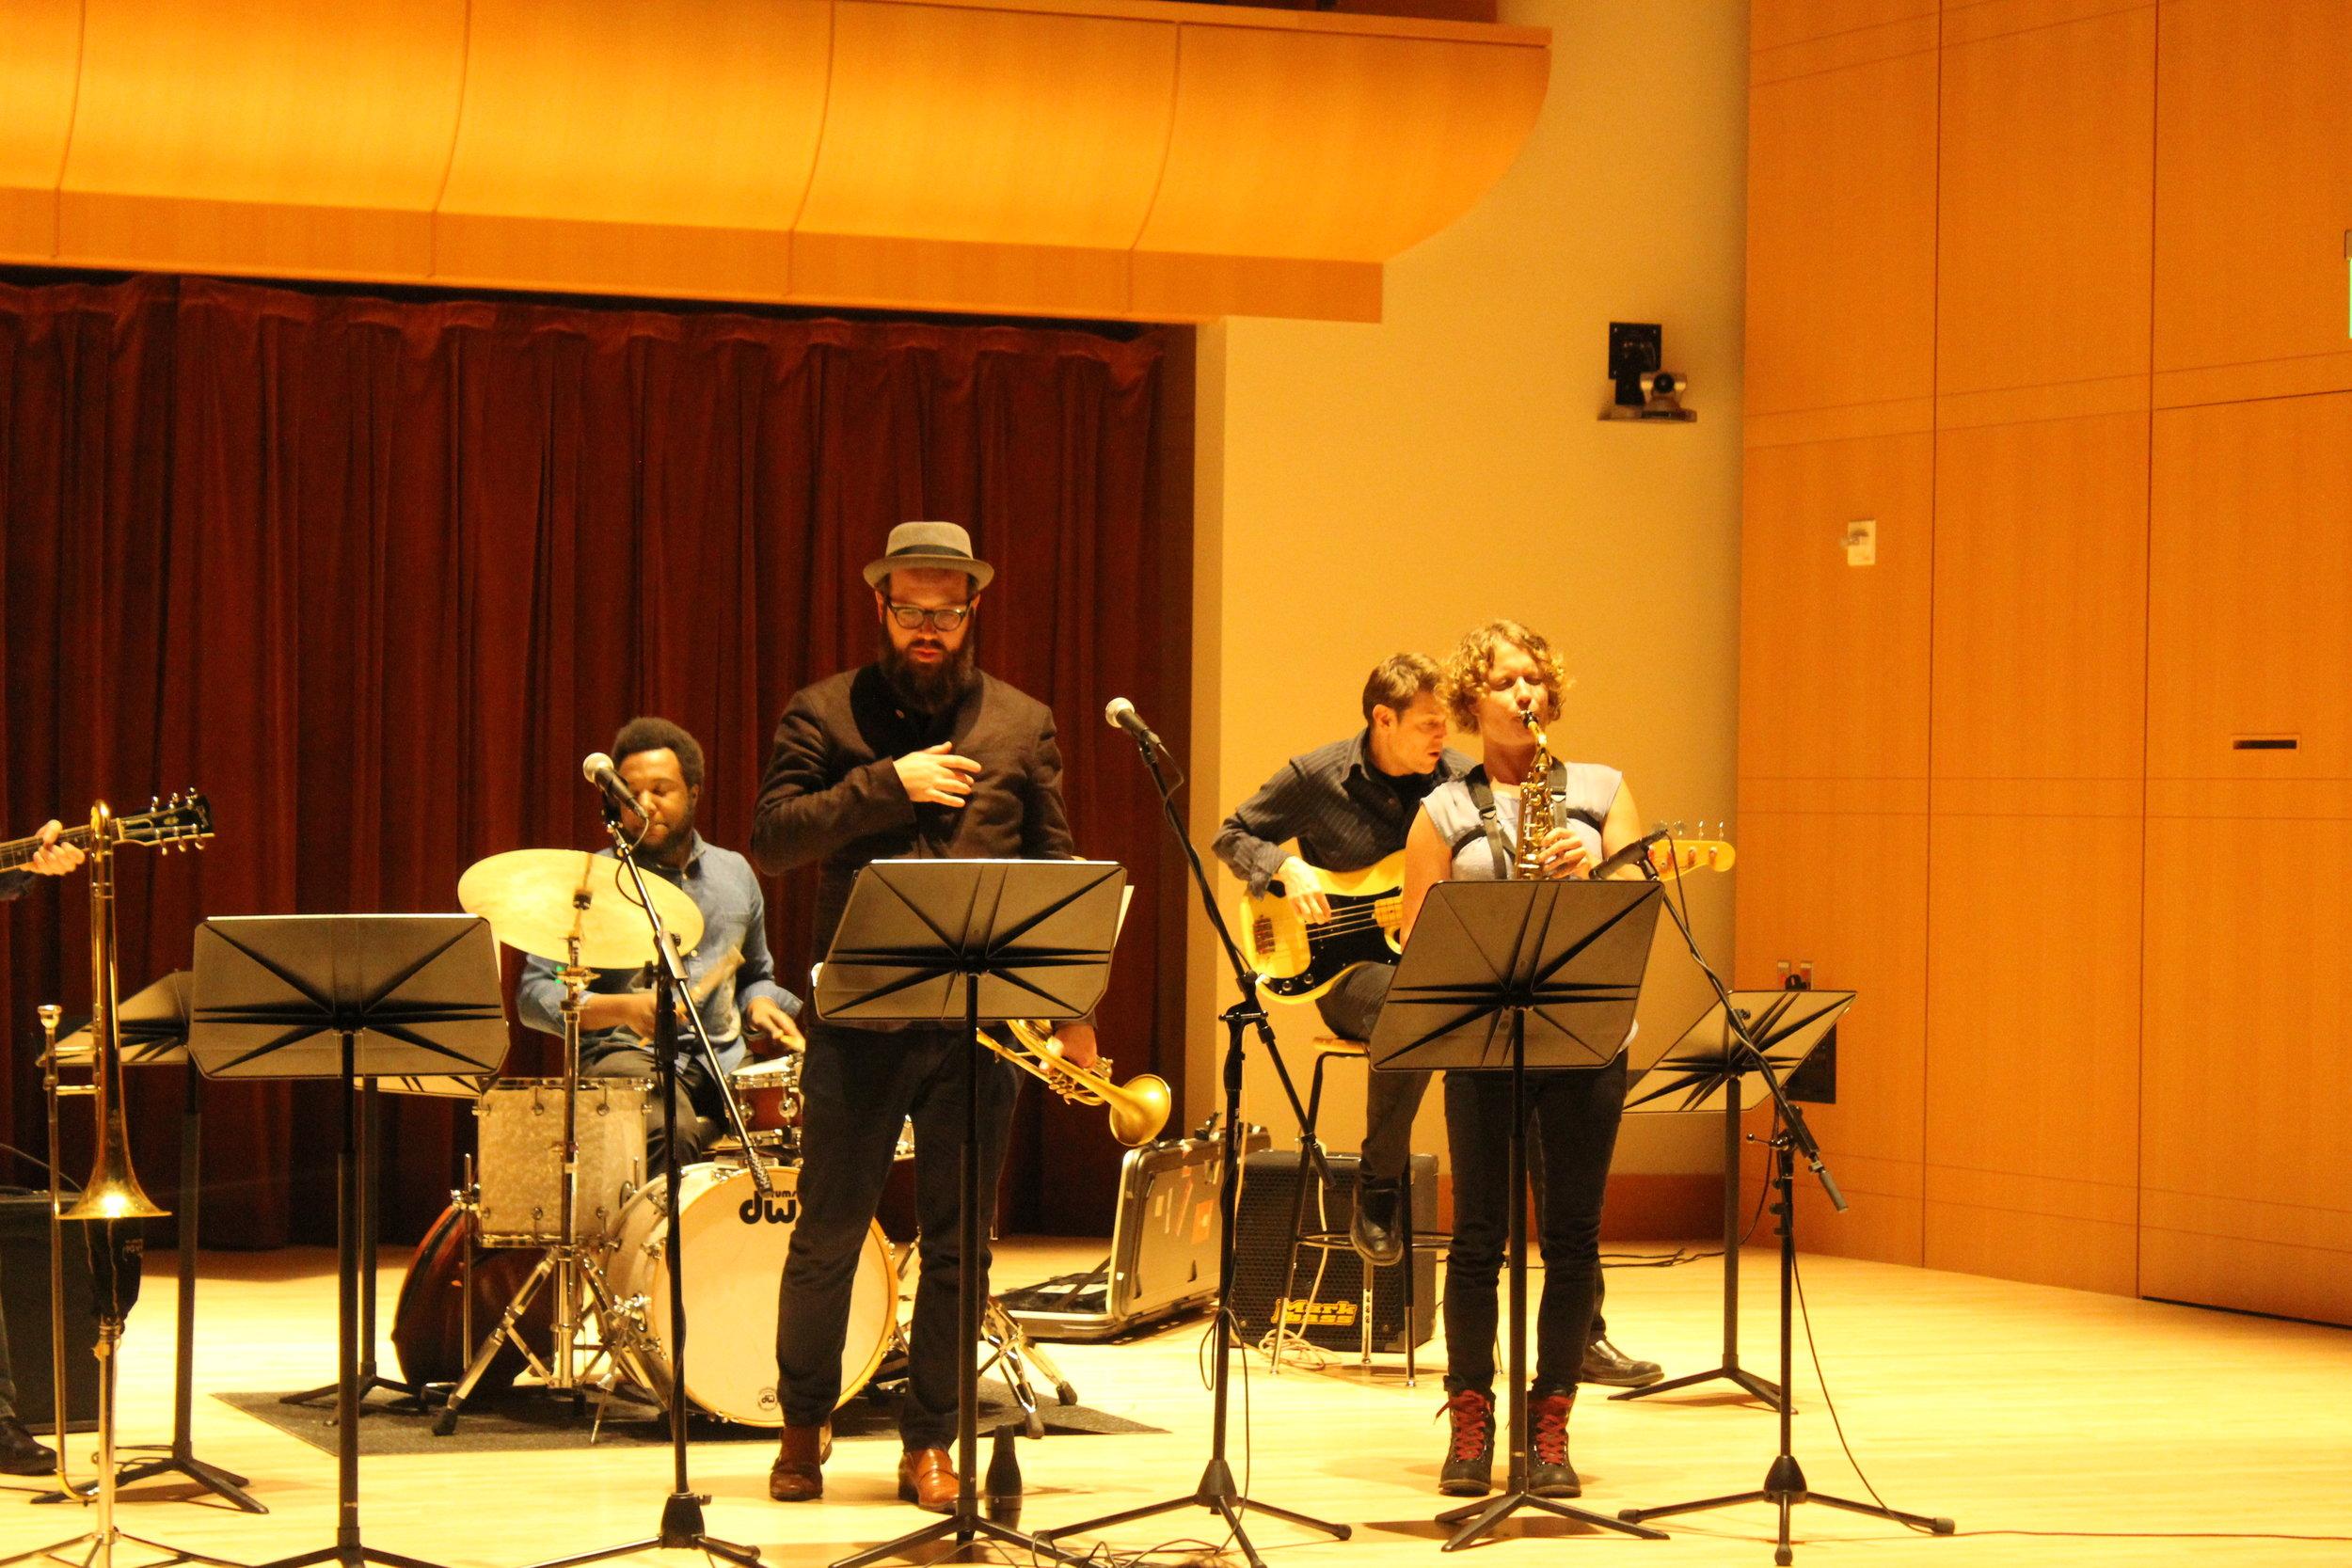 faculty-composers-concert-jade-eriksson_32475454753_o.jpg